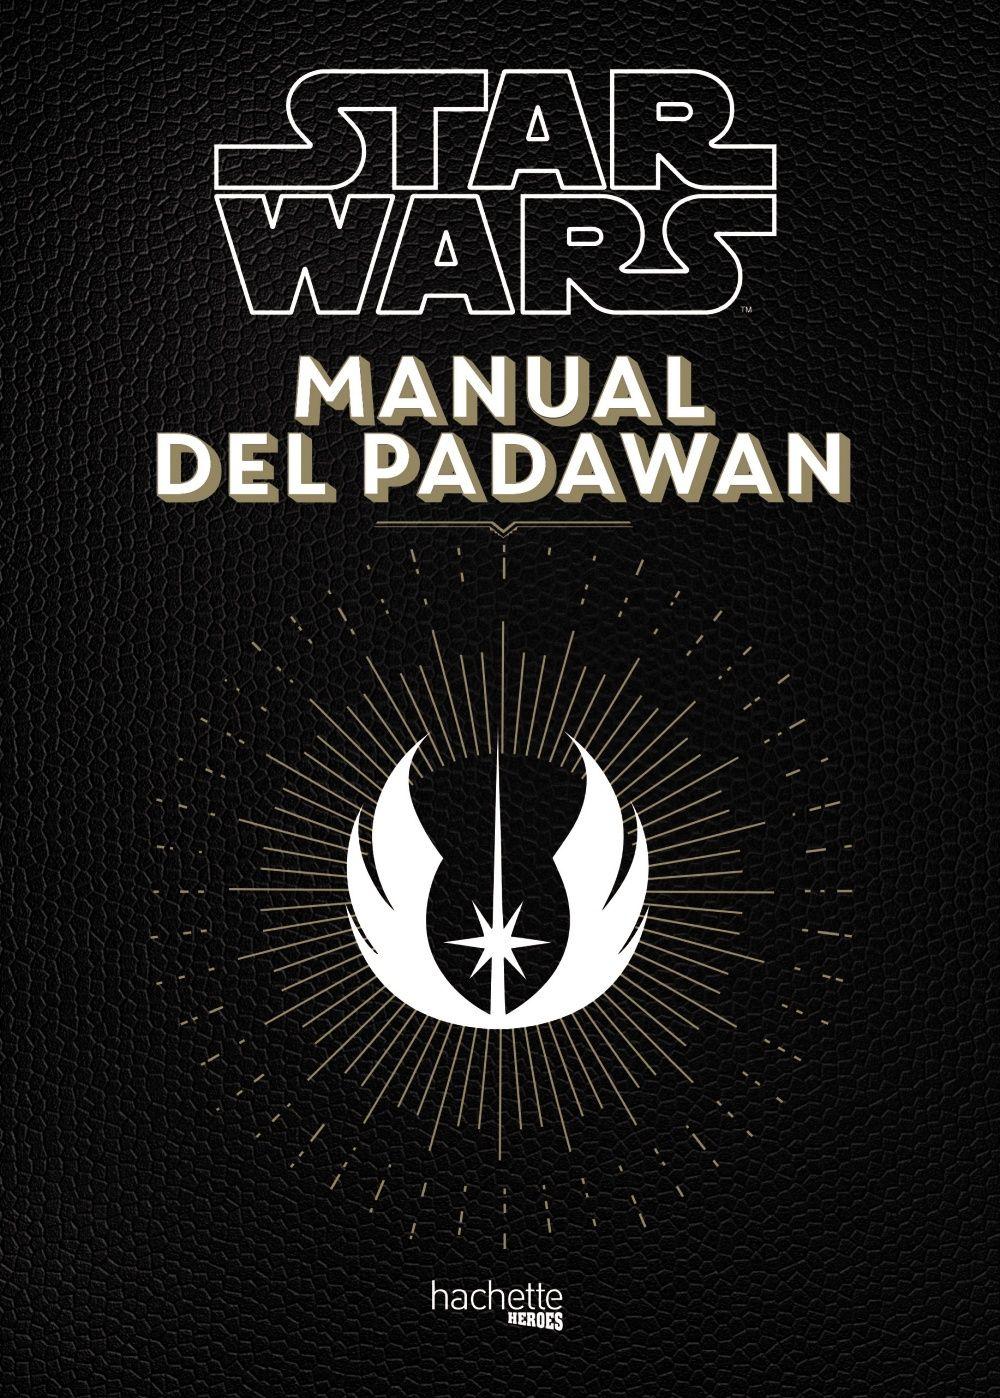 MANUAL DEL PADAWAN